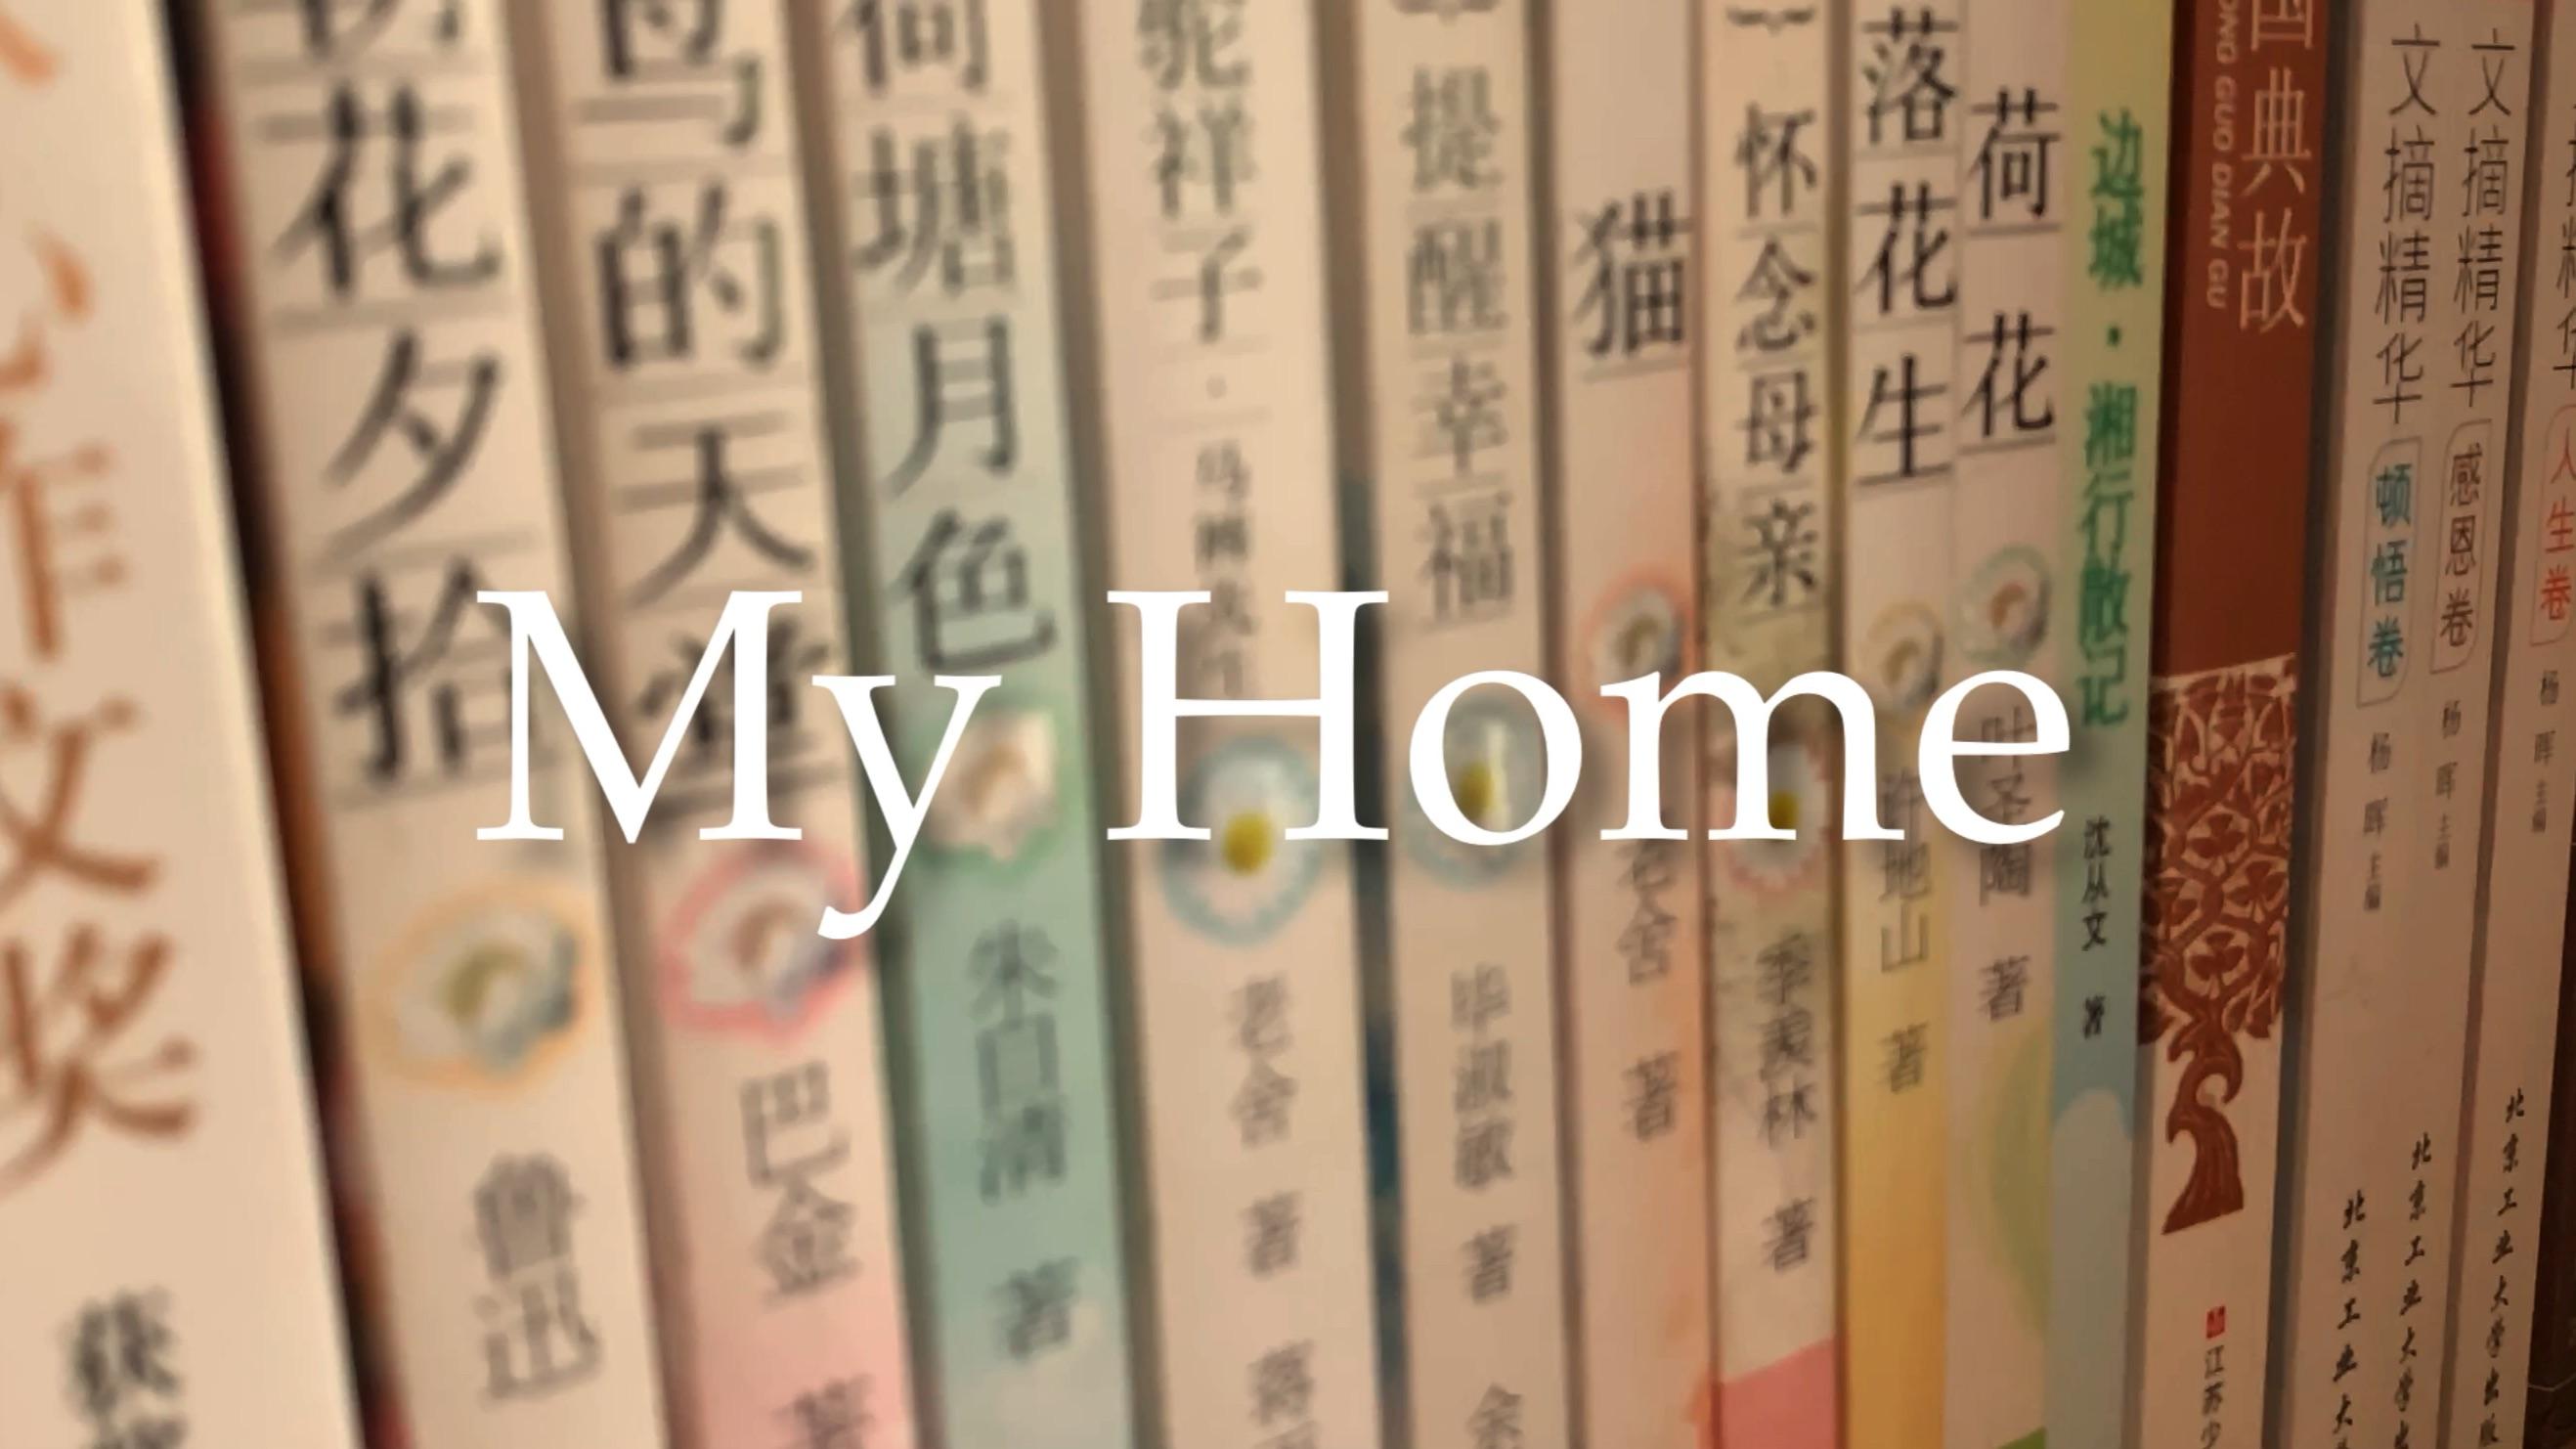 iPhone拍摄练习: My Home